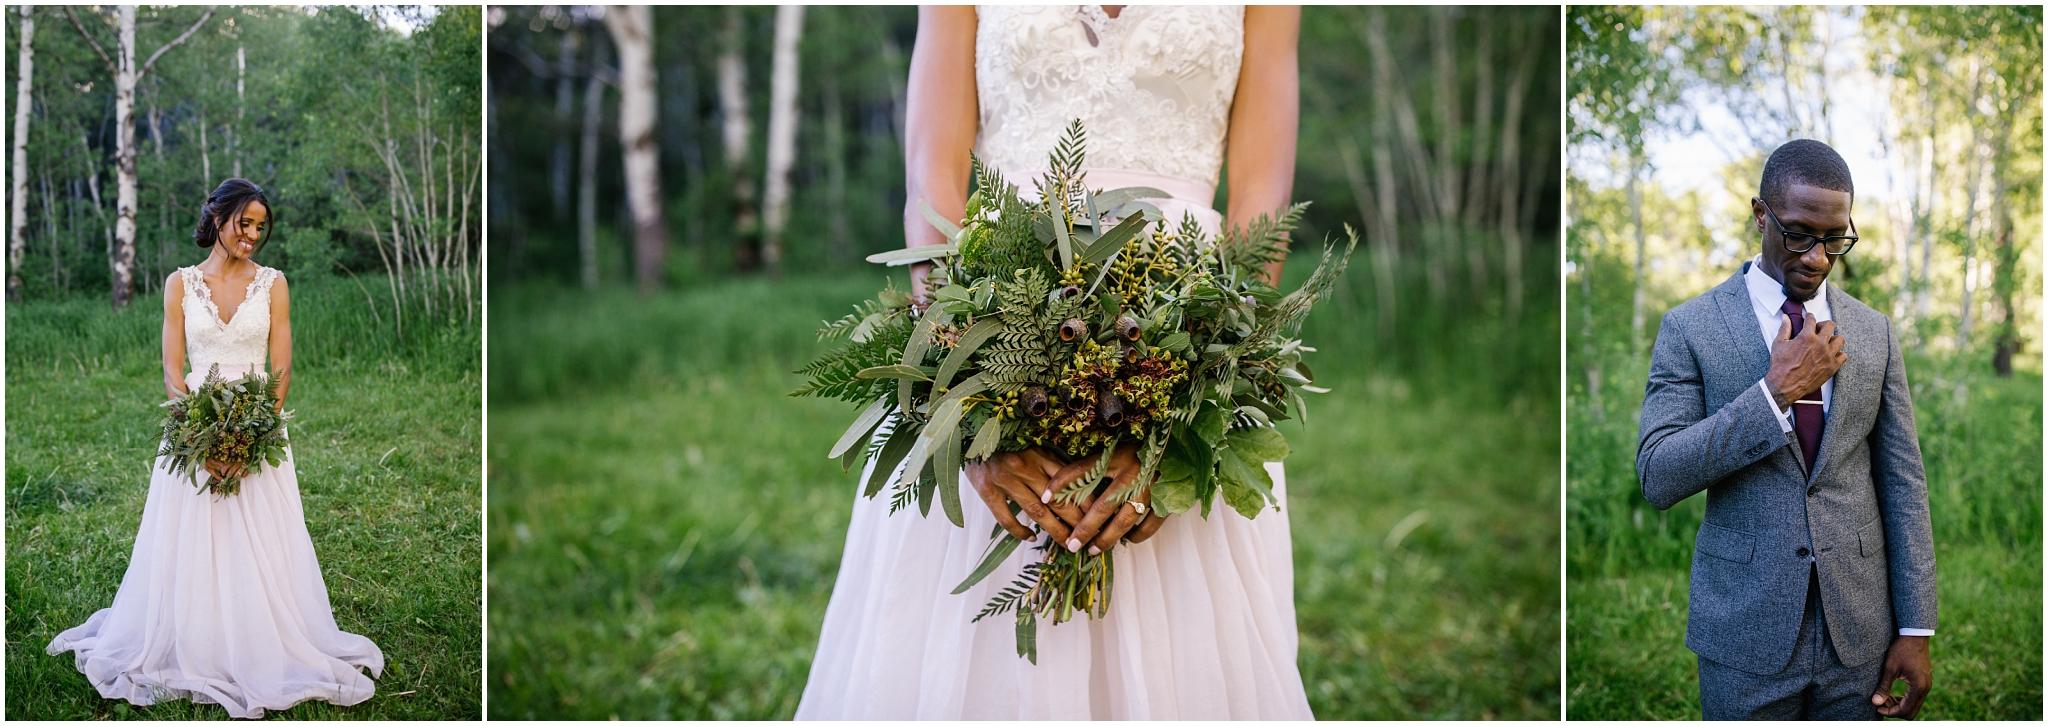 TreeHorseShoot-72_Lizzie-B-Imagery-Utah-Wedding-Photographer-Salt-Lake-City-Park-City-Oakley.jpg